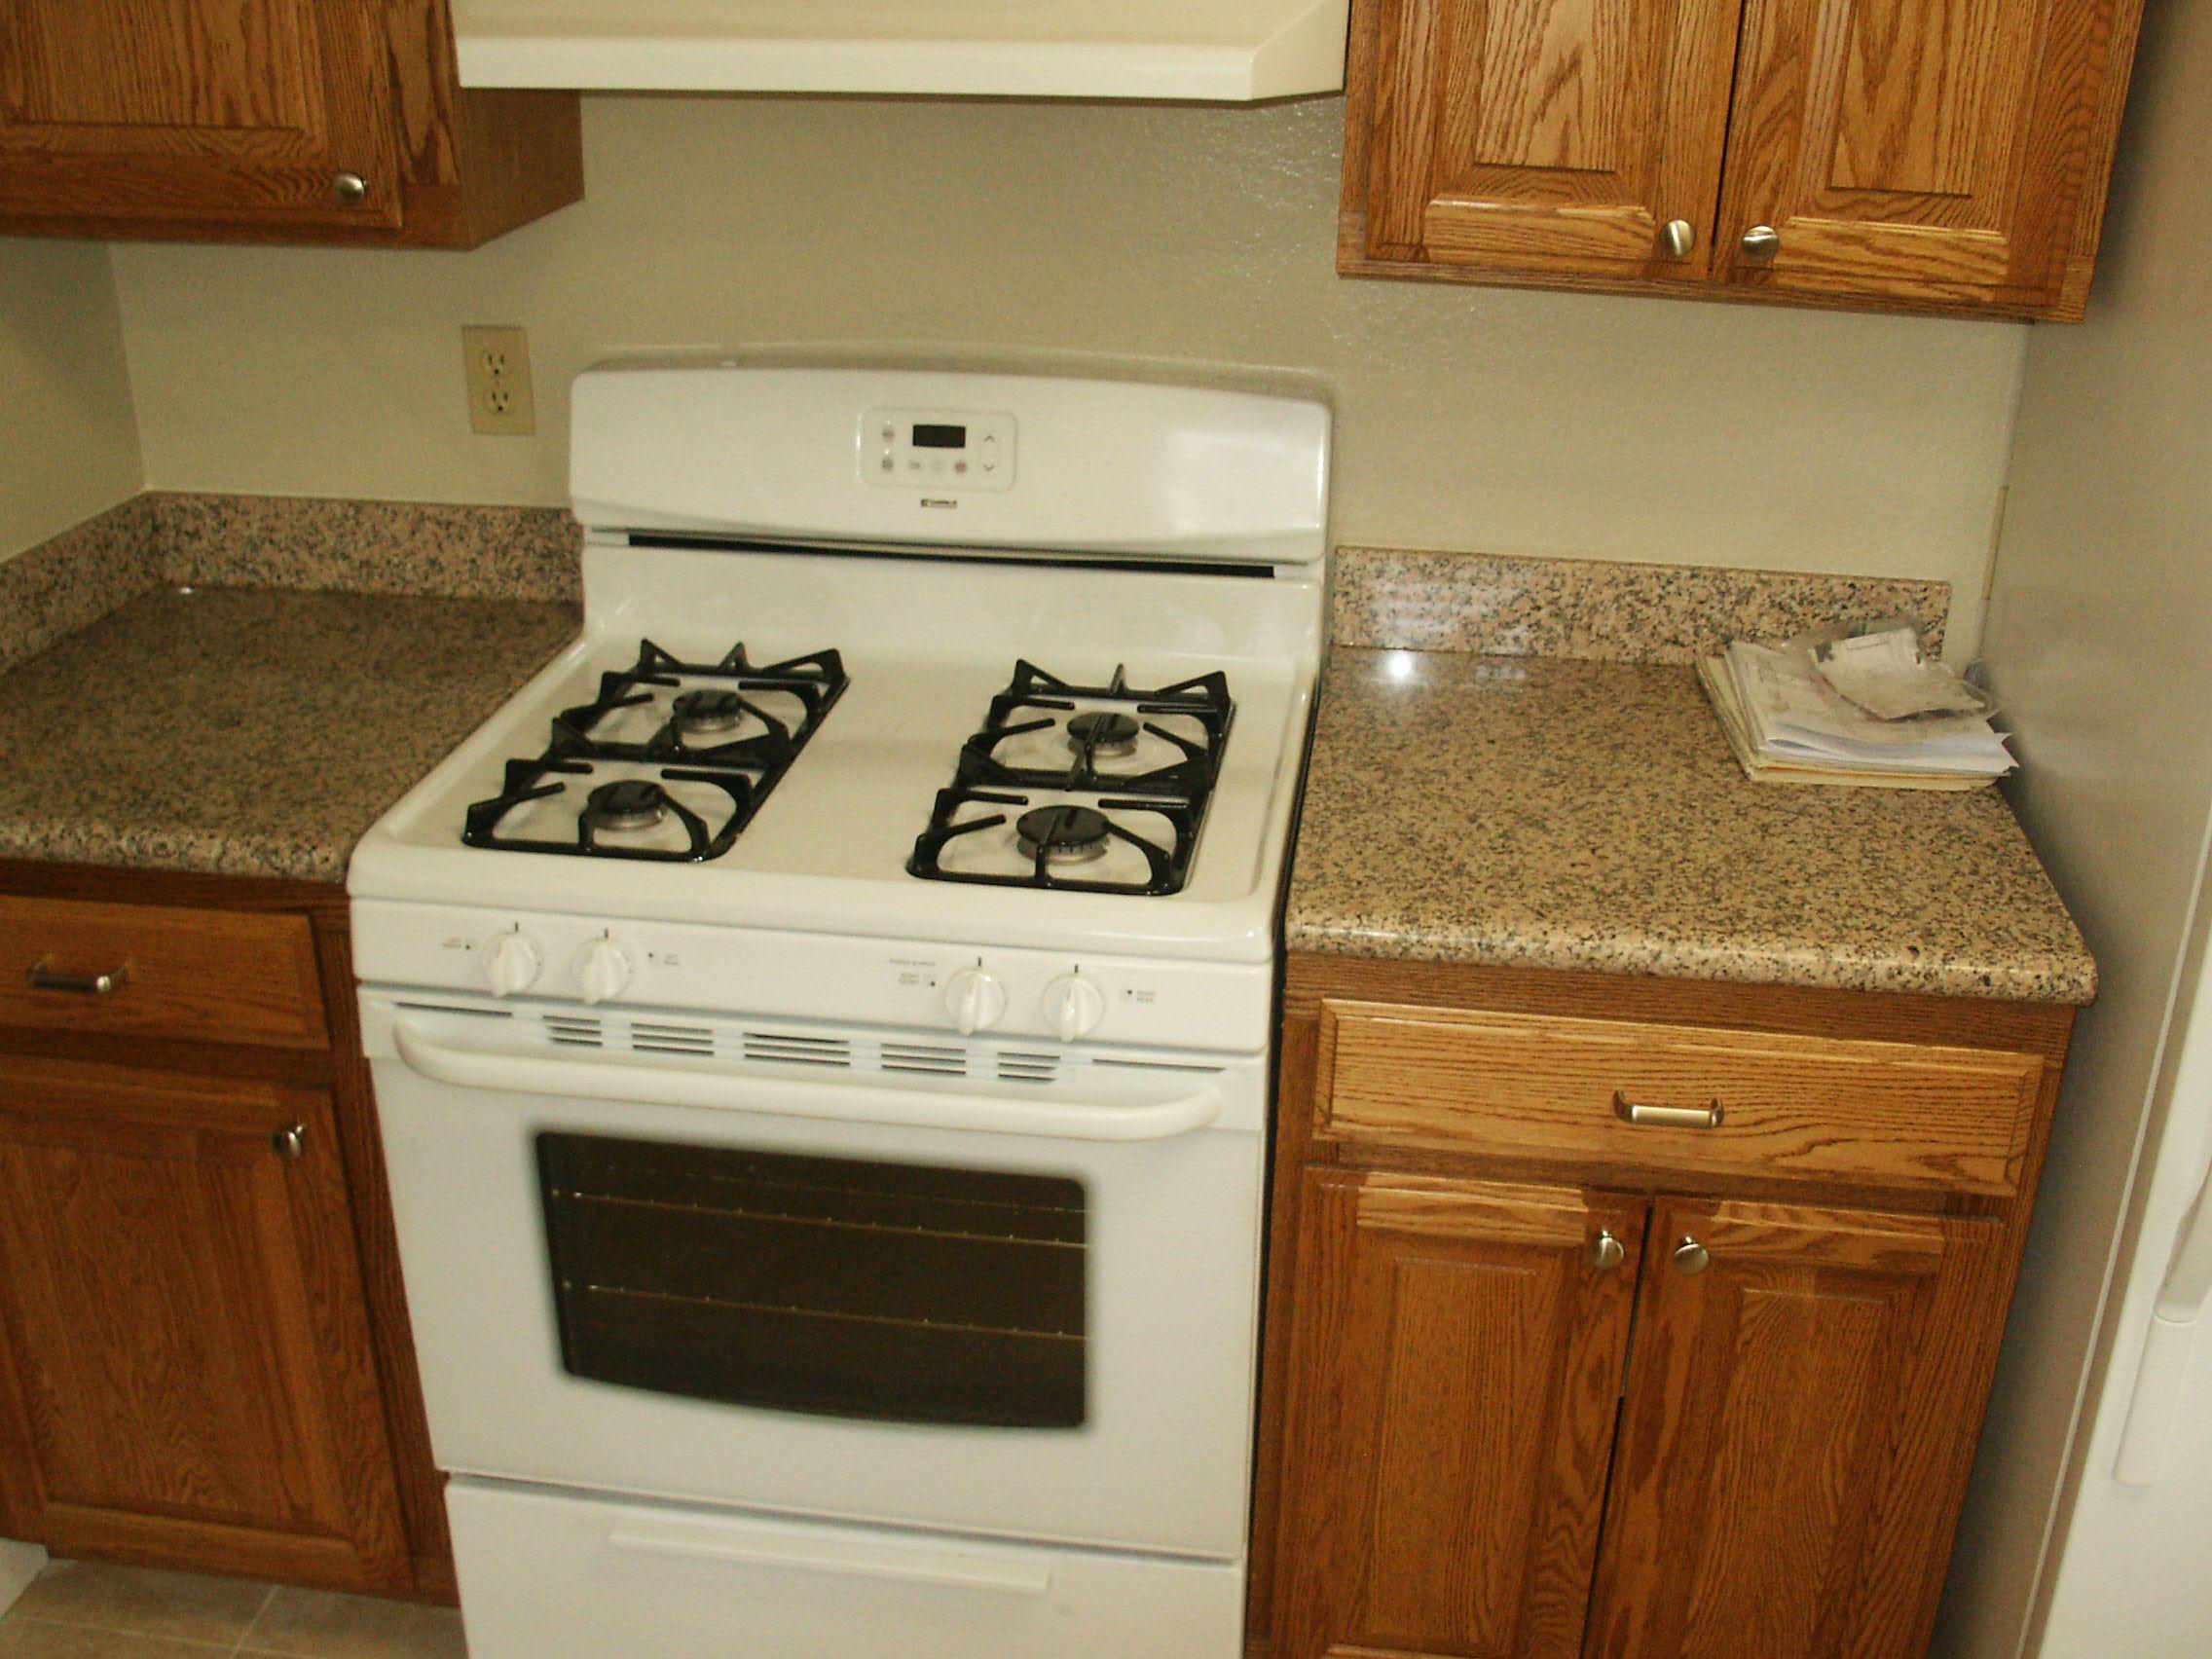 Kitchen Quartz Countertops With Oak Cabinets Kitchen Design For Small Room Quartz Countertops